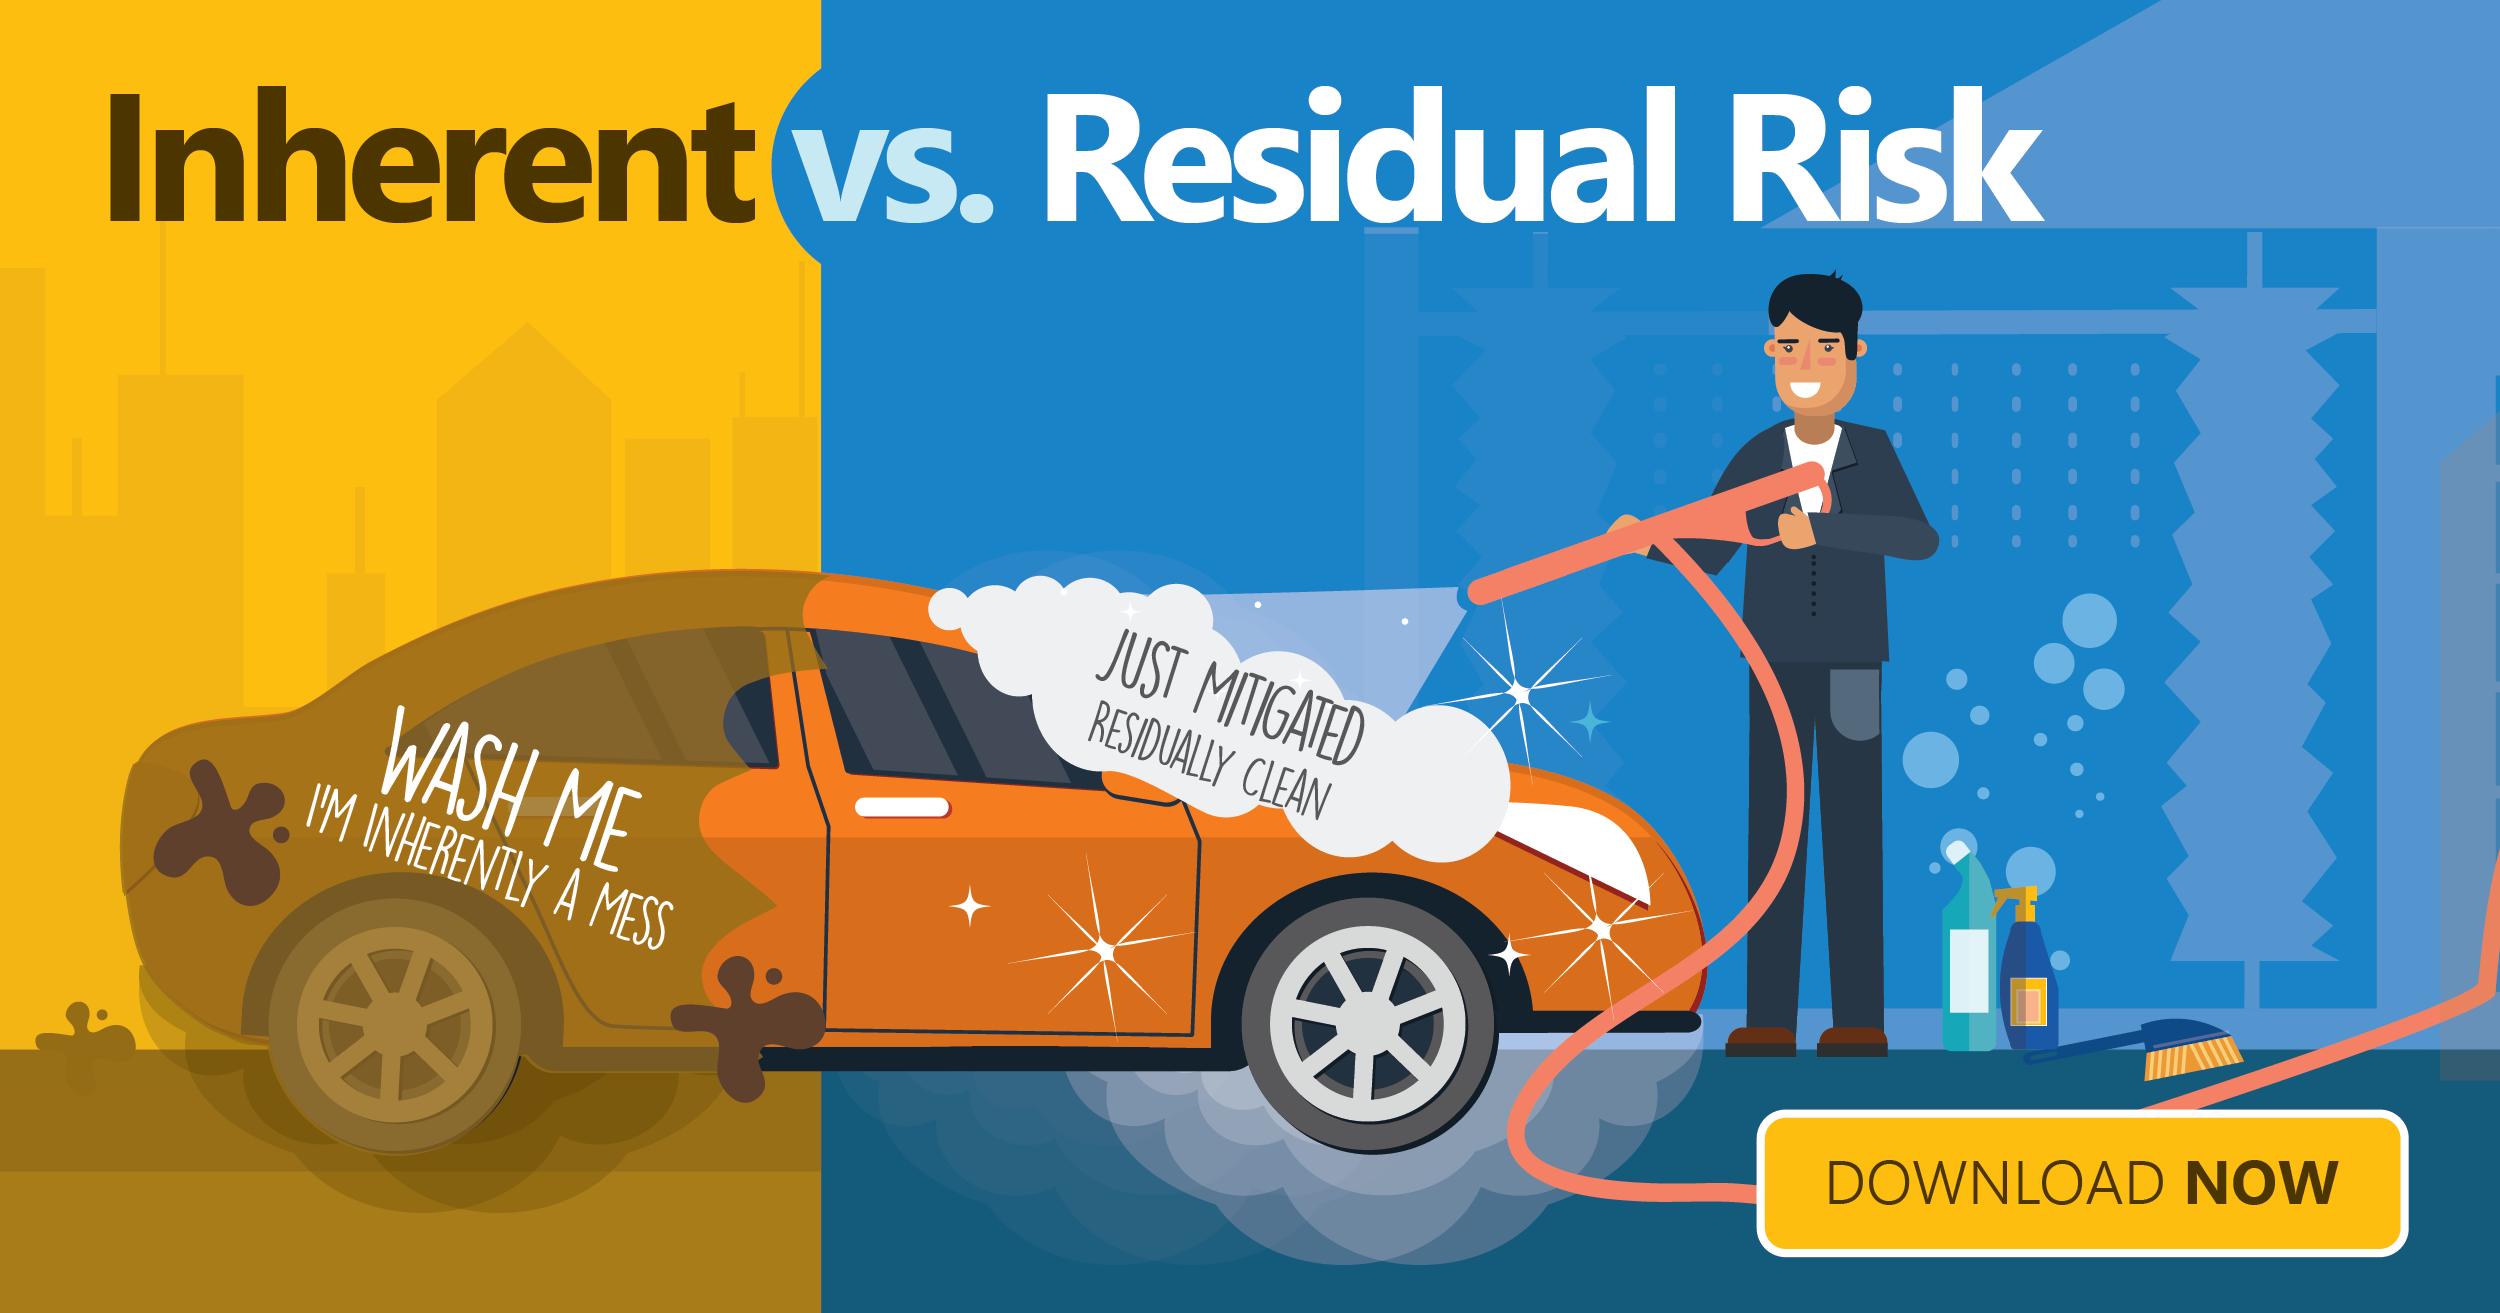 inherent vendor risk versus residual vendor risk